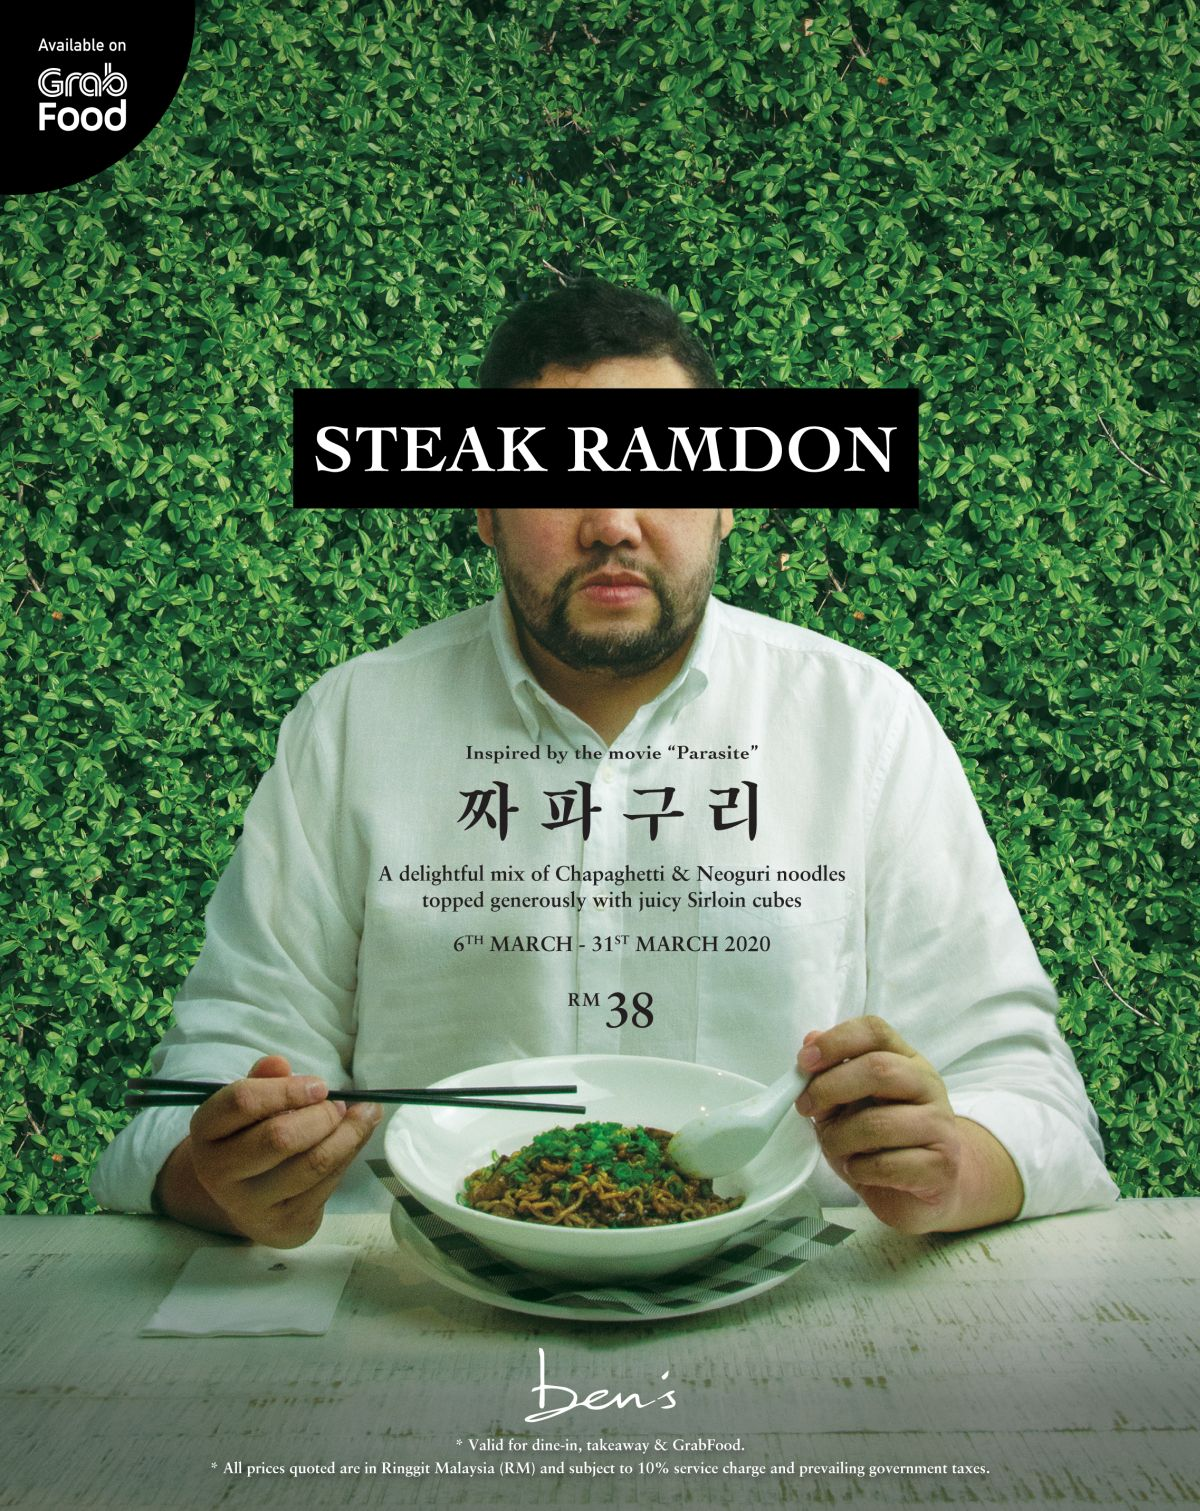 Ben's Steak Ramdon - The BIG Group